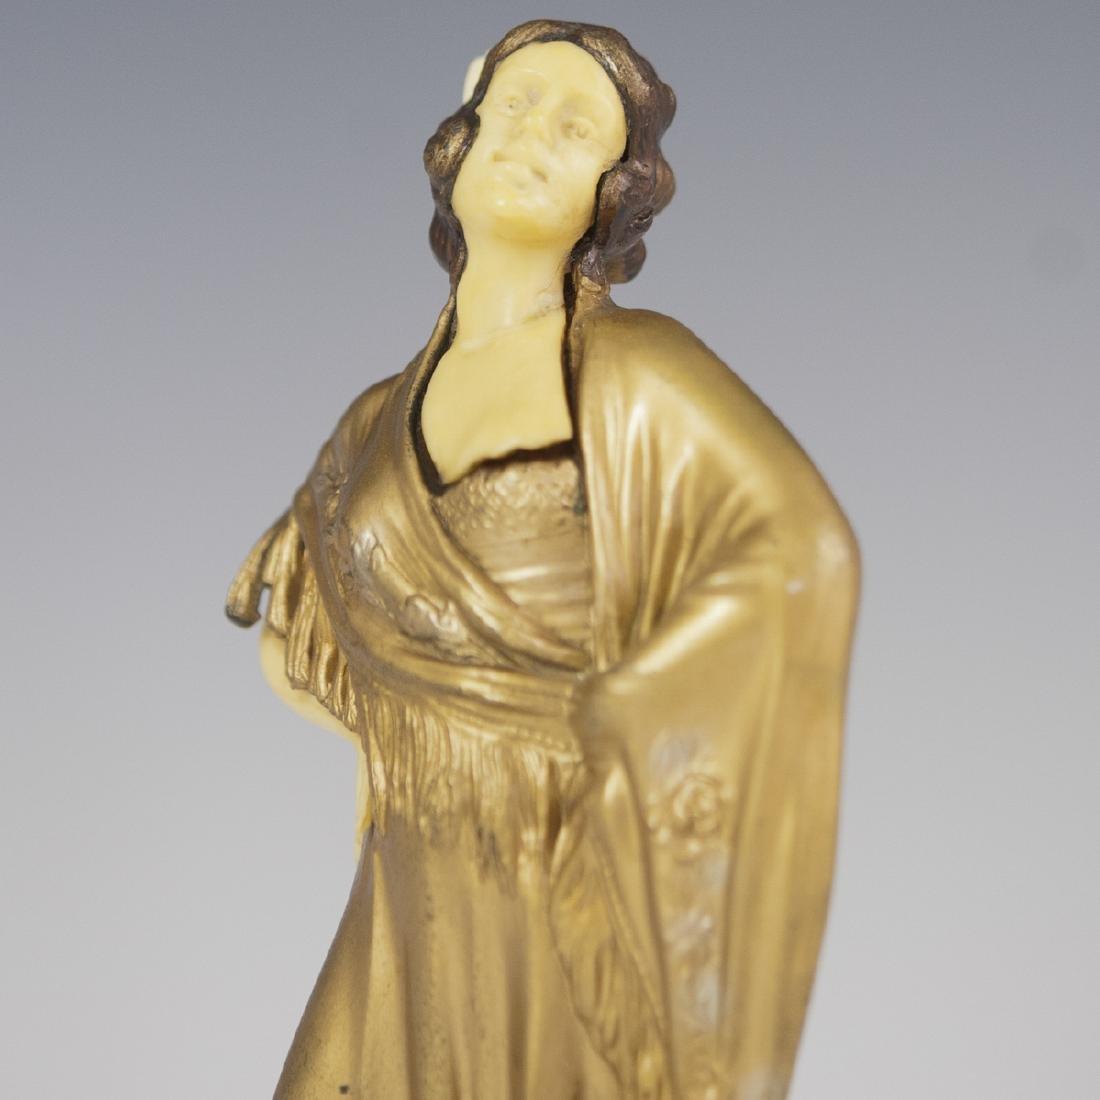 Art Deco Polychromed Spelter Sculpture - 2